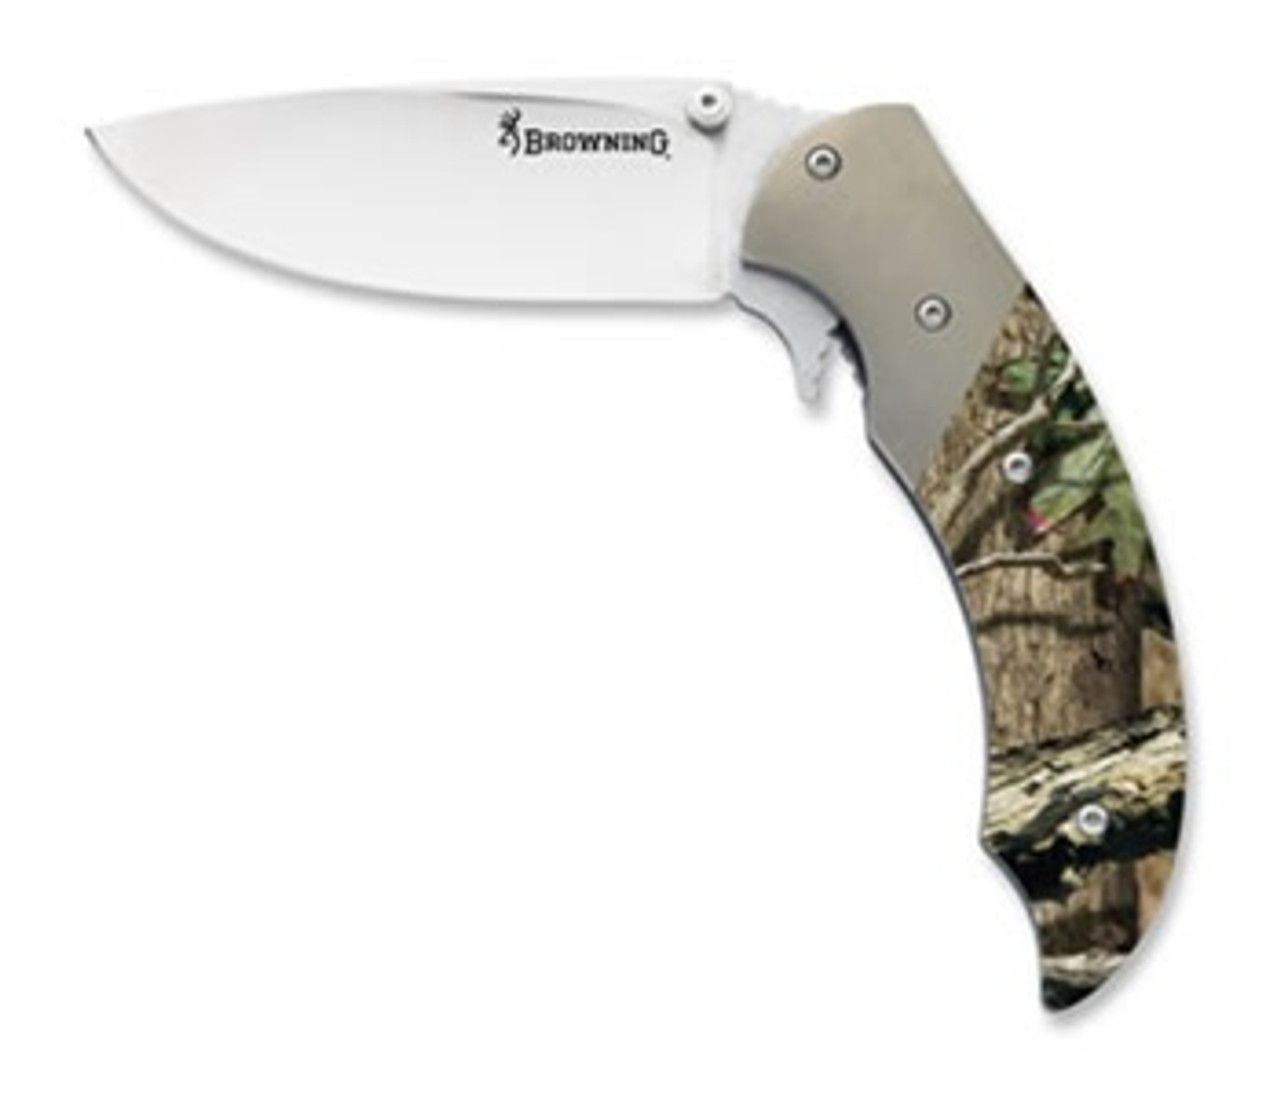 Browning Tactical Hunter Folder Knife, Mossy Oak Handle, 503